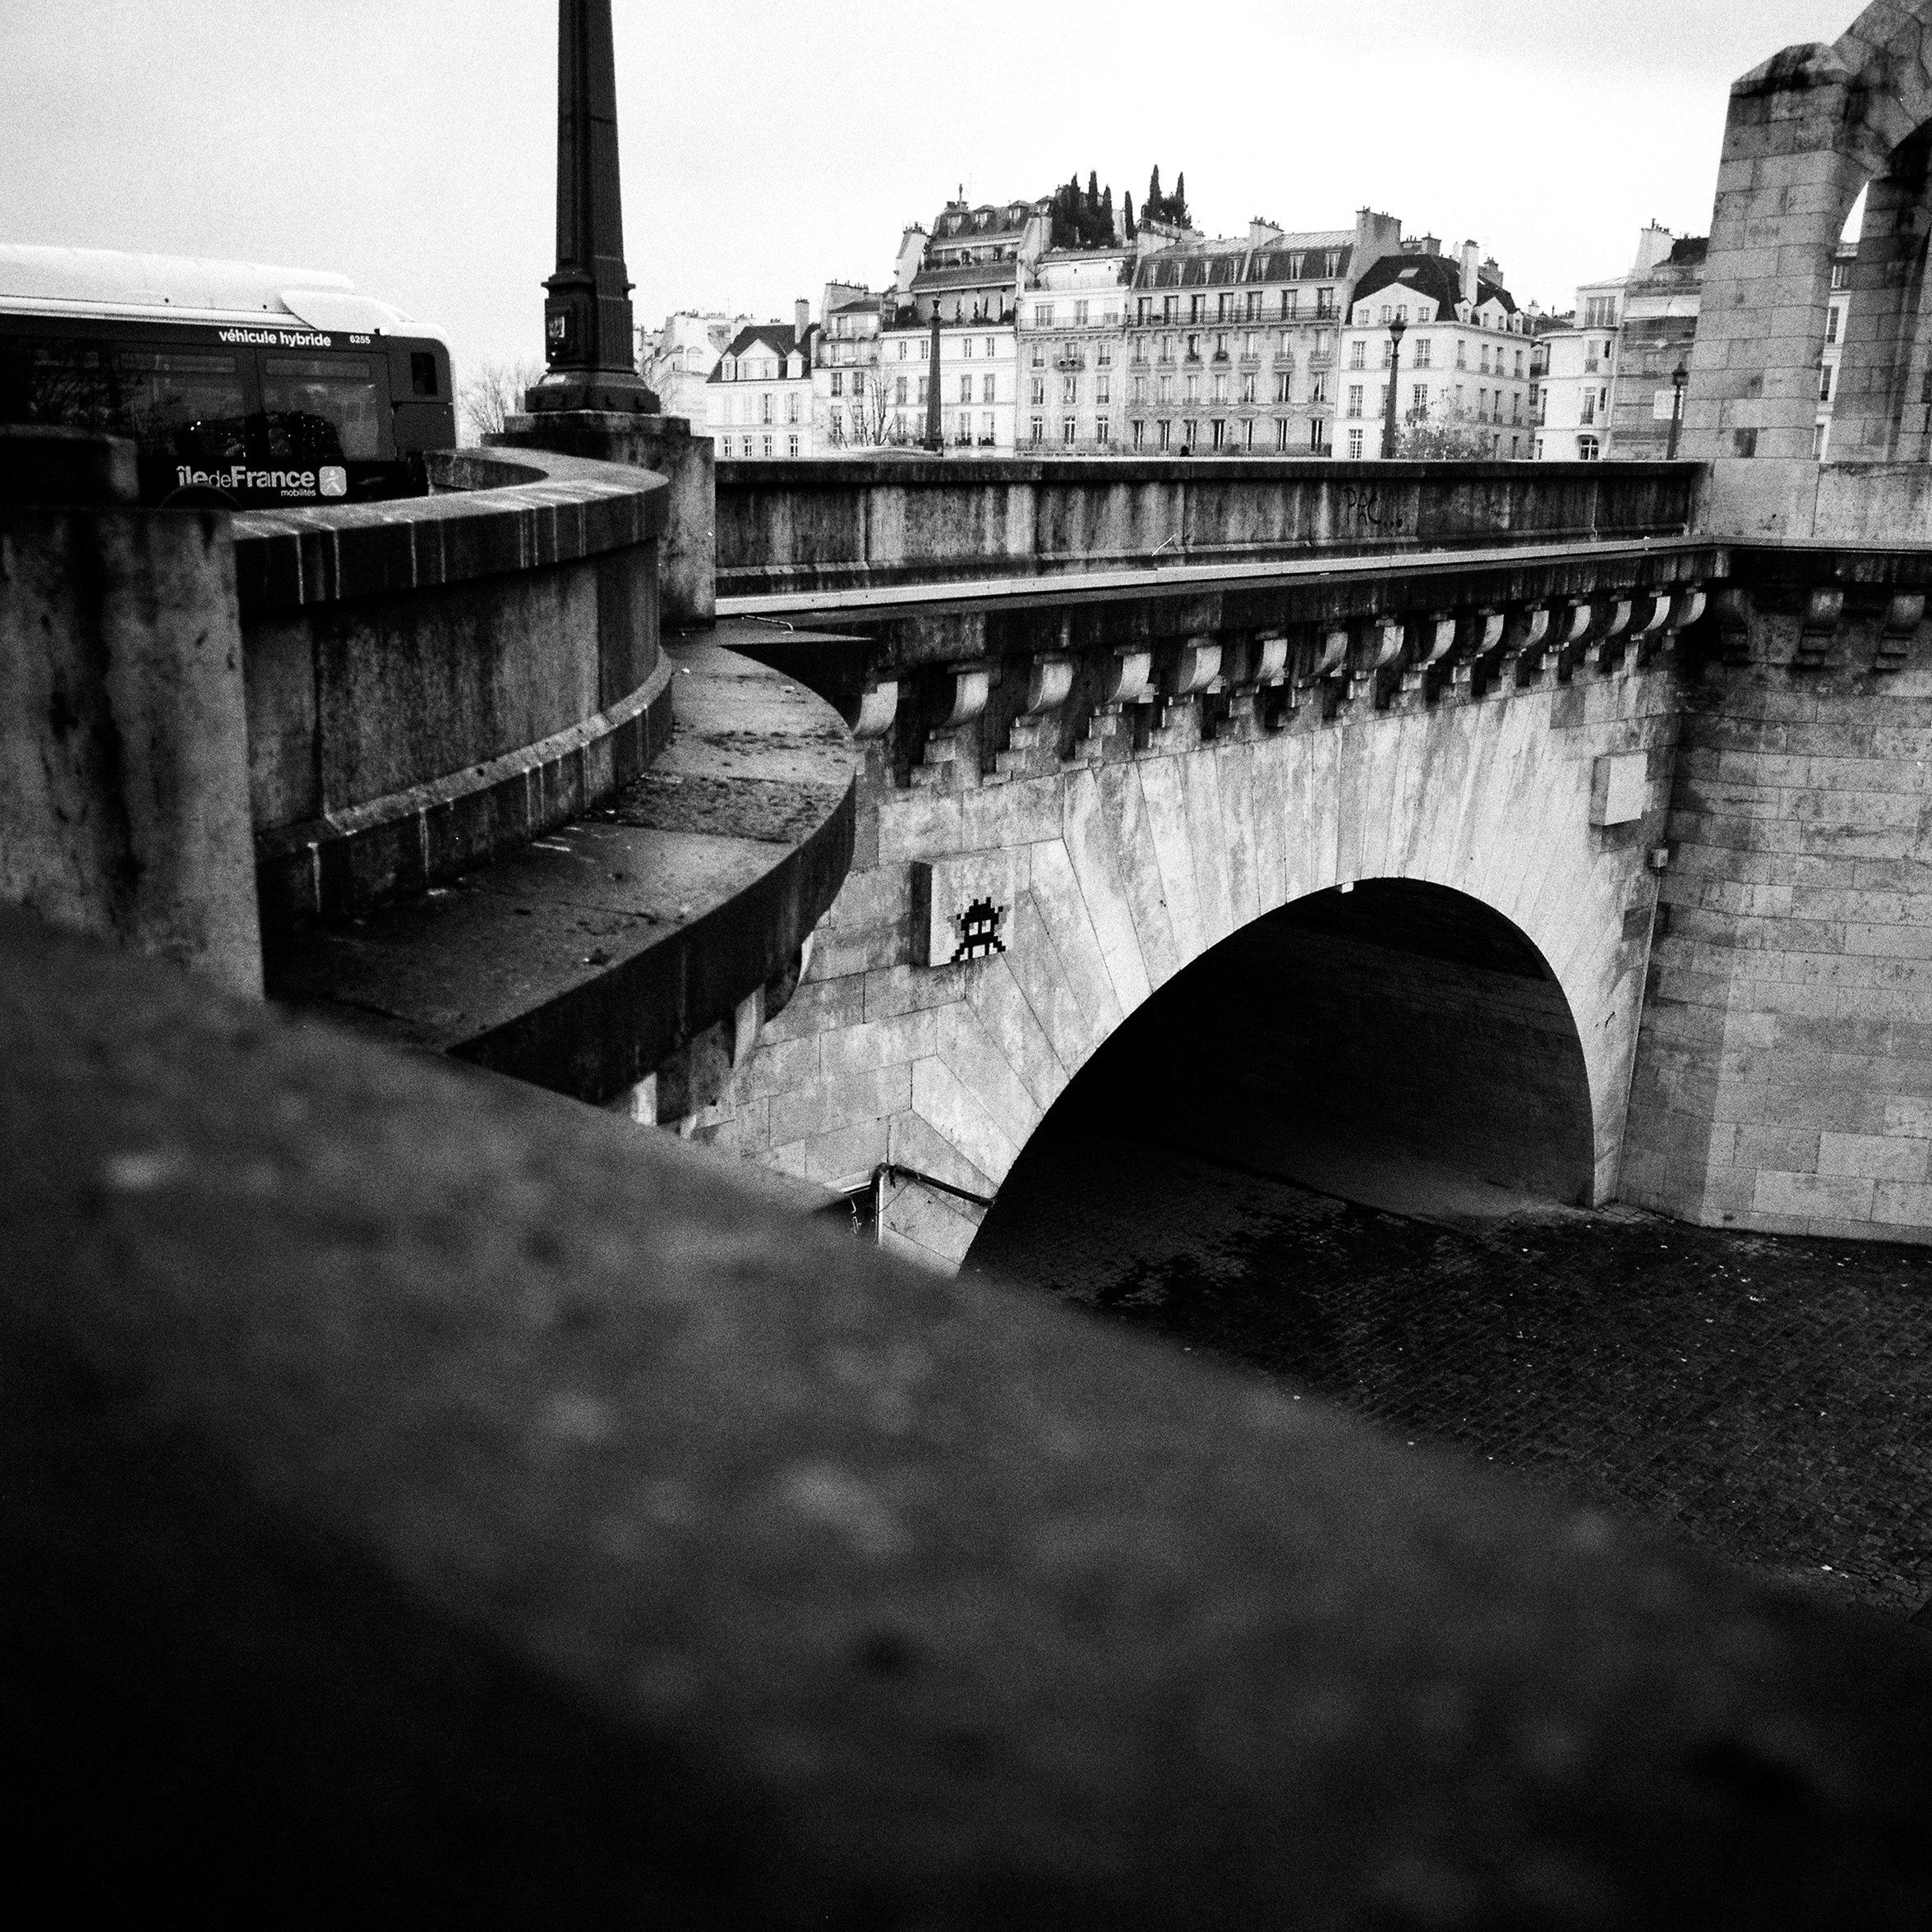 Paris Hasselblad B&W-0020.jpg